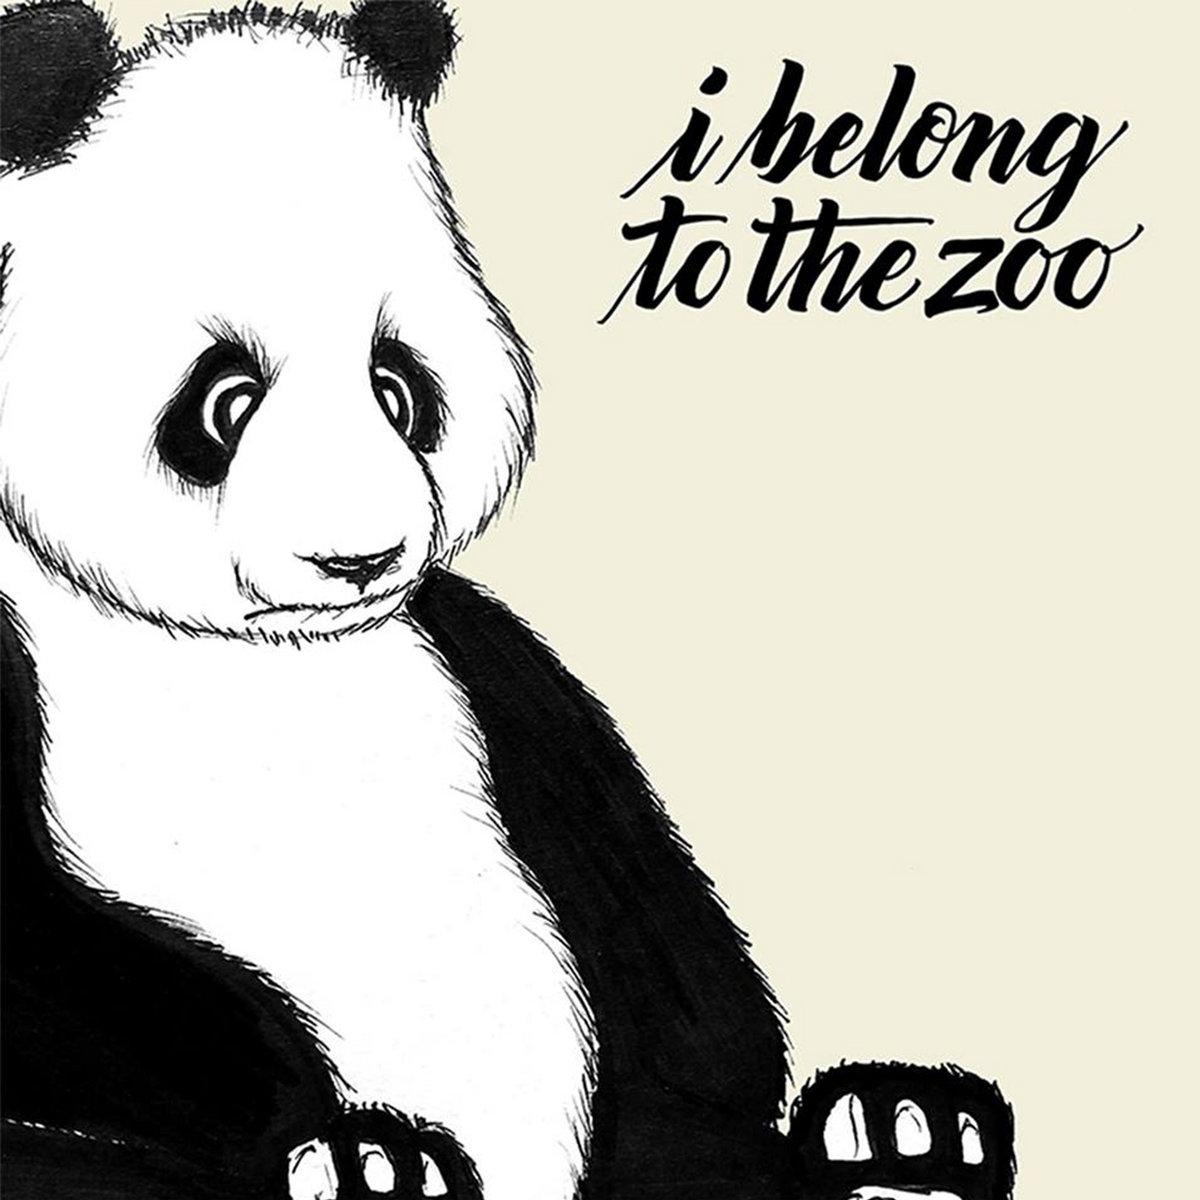 sana i belong to the zoo mp3 download free